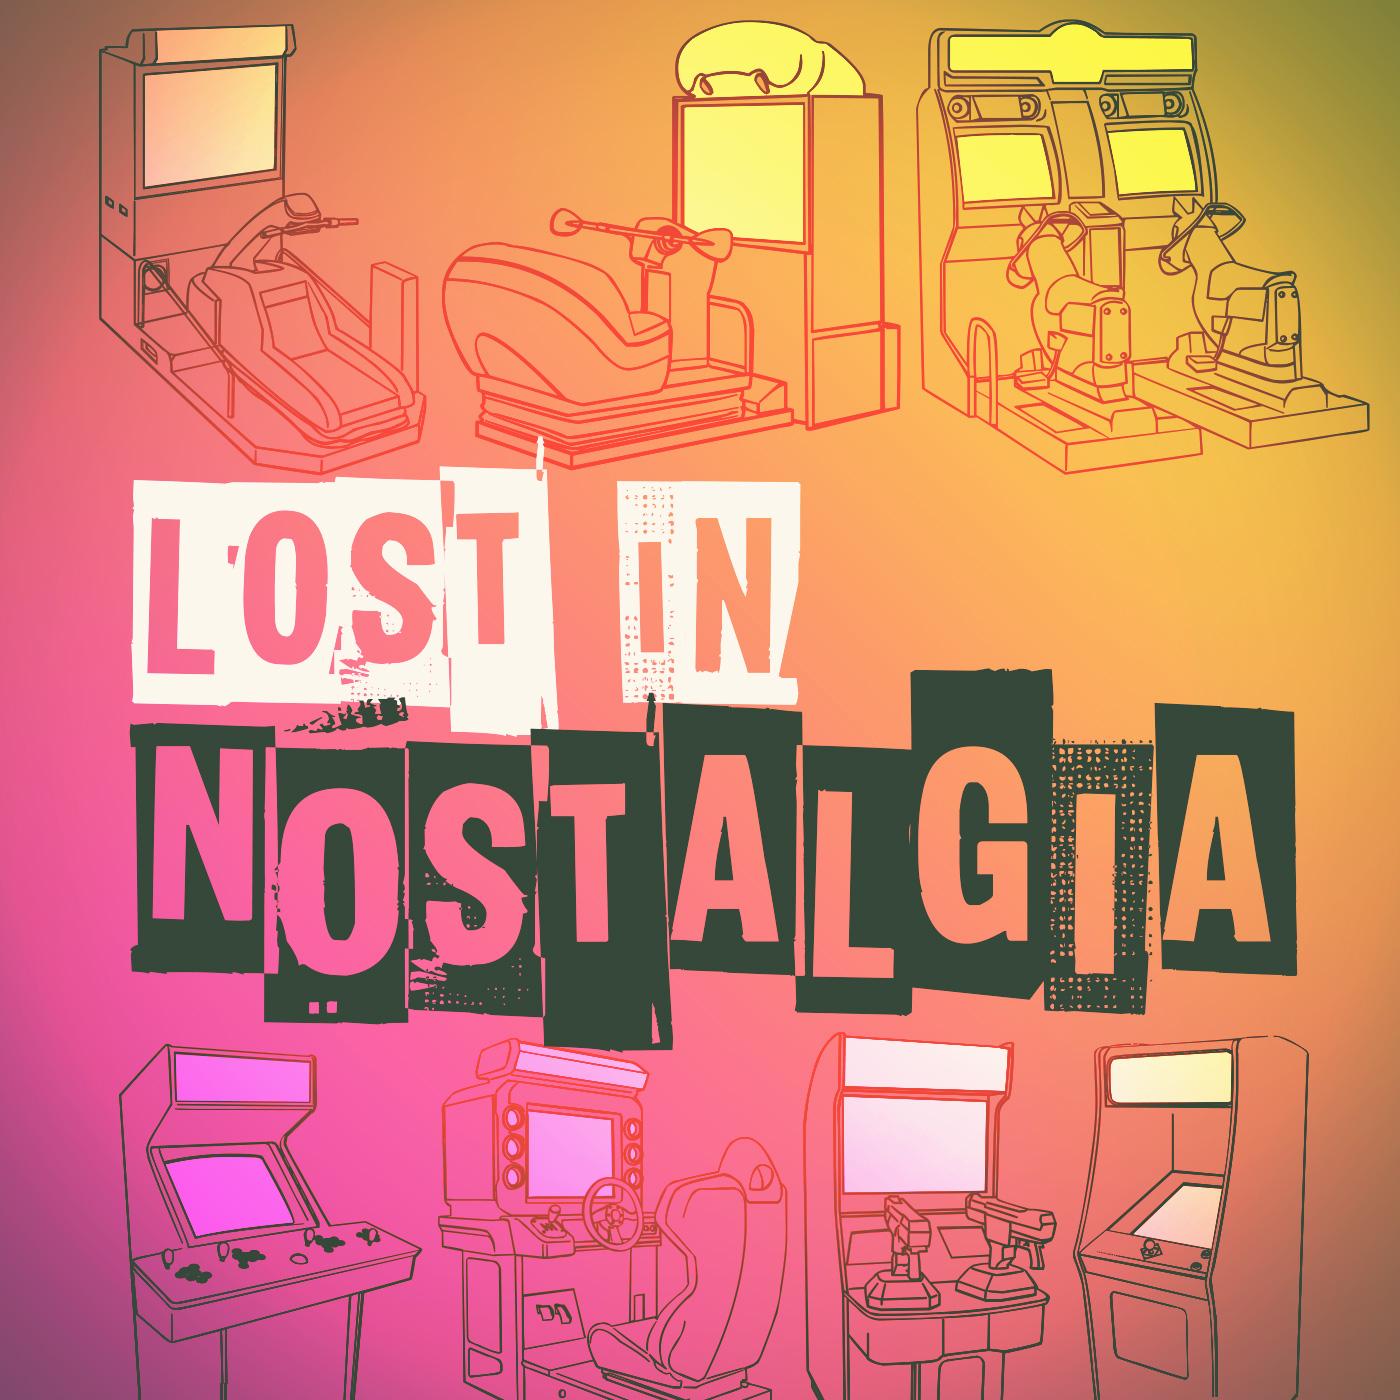 Lost in Nostalgia